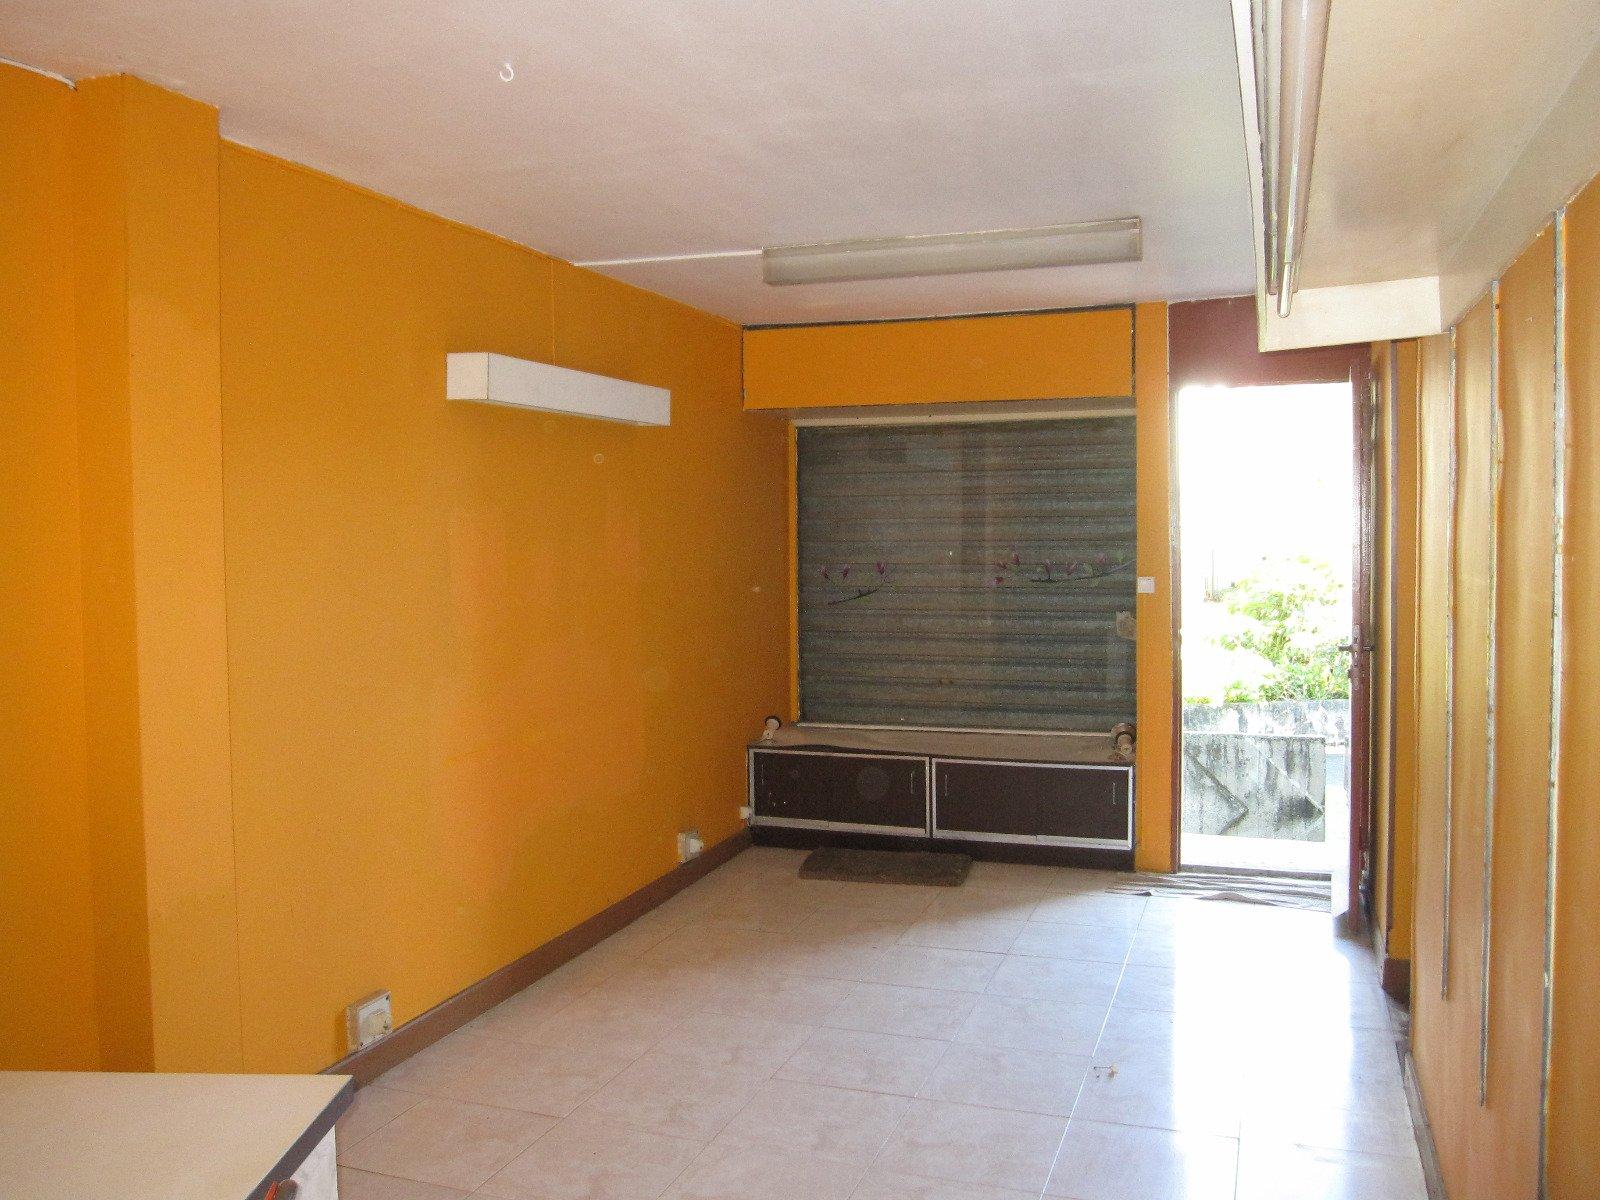 achat local professionnel pointe pitre 97110 guadeloupe centre r f 2988. Black Bedroom Furniture Sets. Home Design Ideas